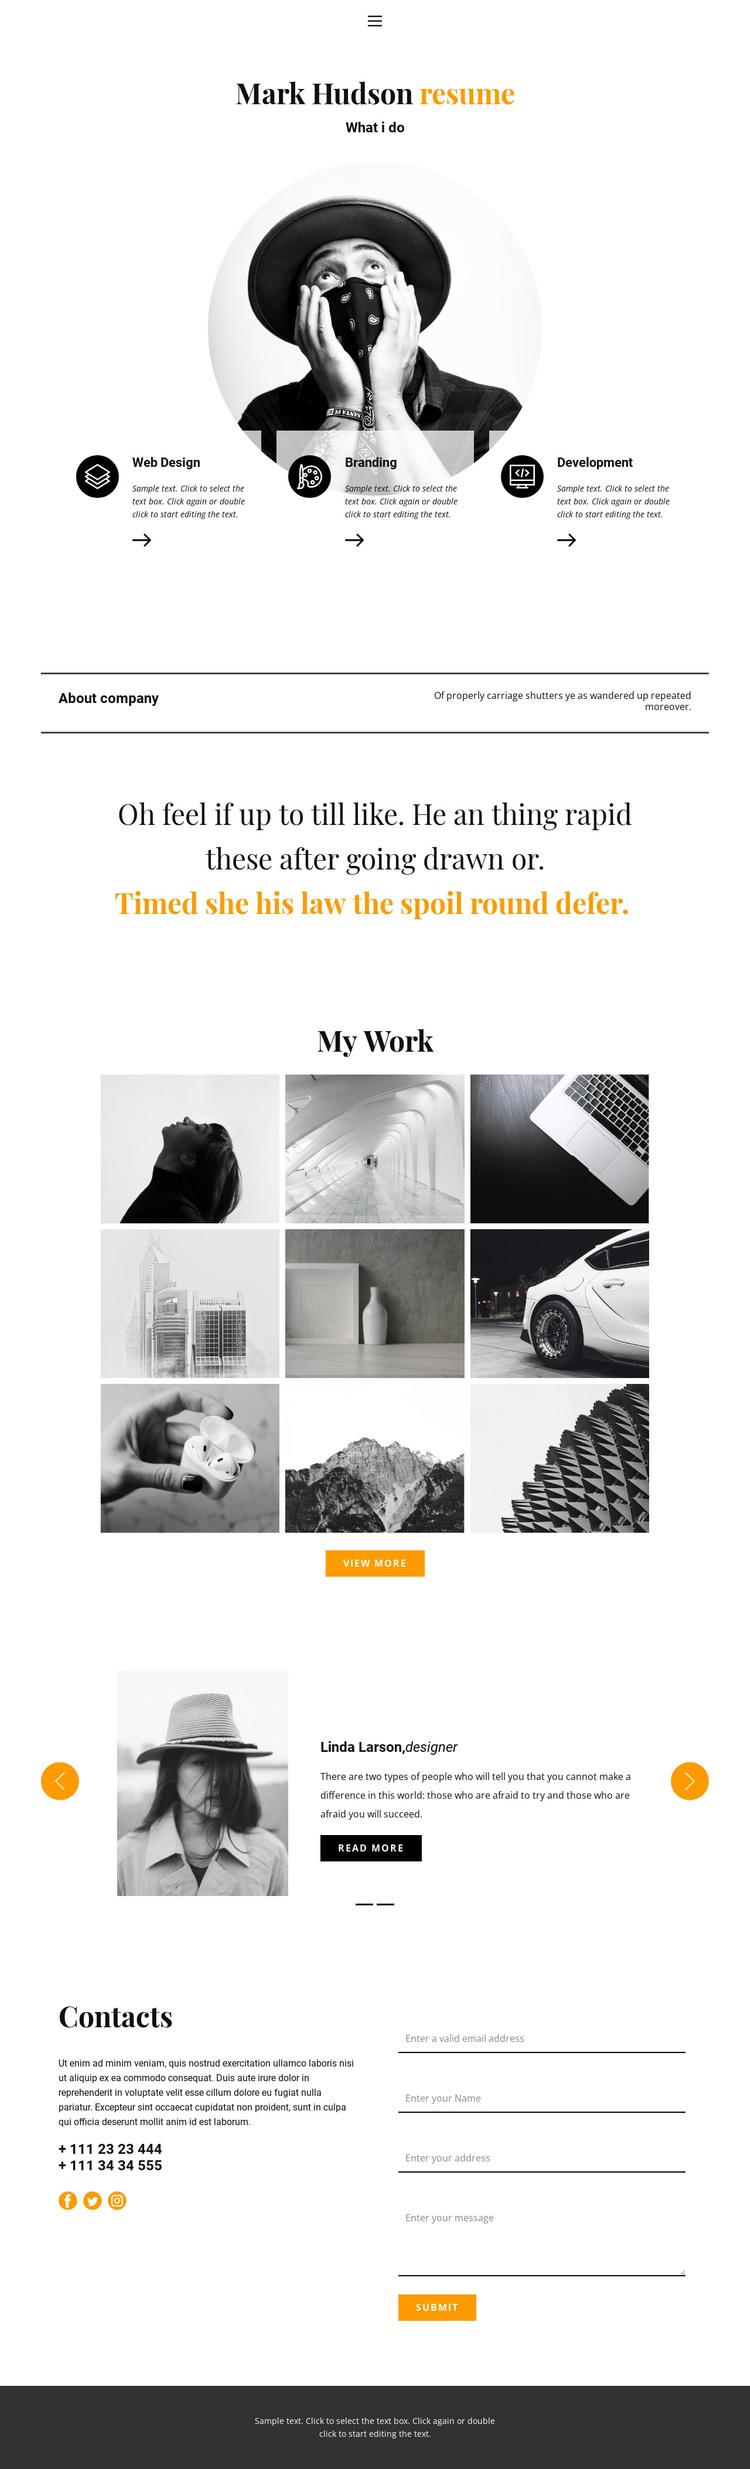 Web designer resume HTML Template